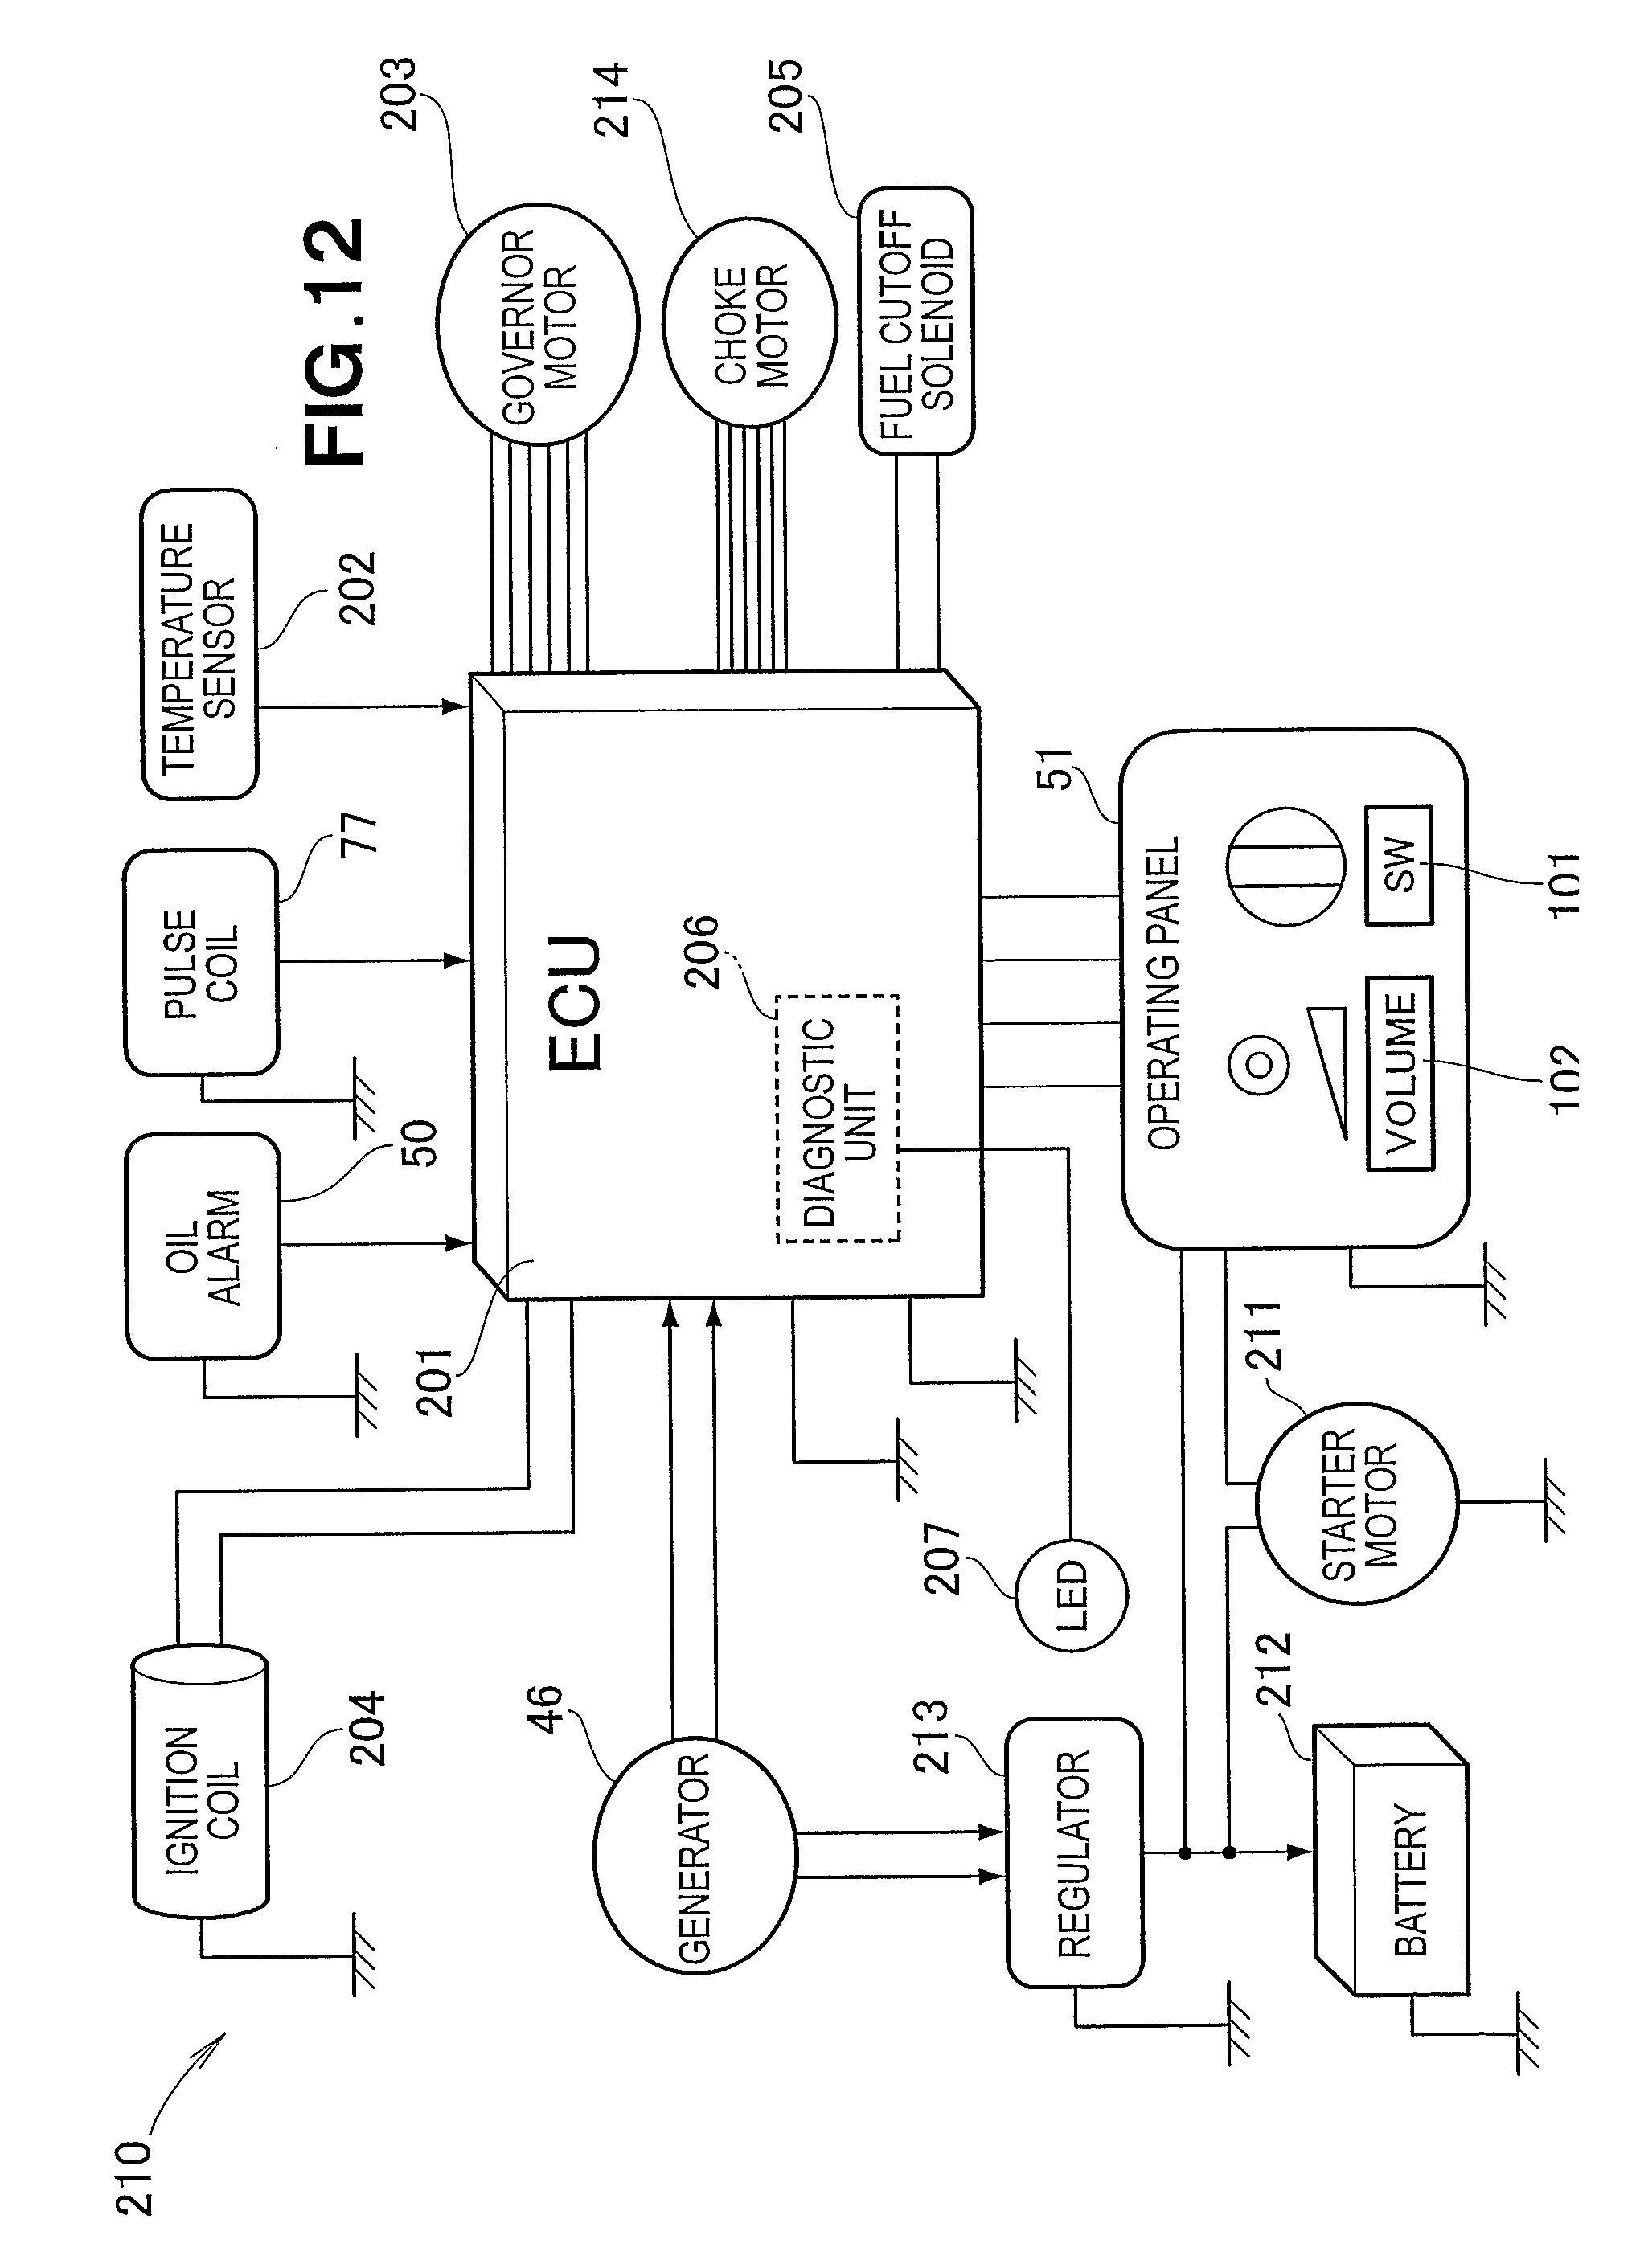 Fg Wilson 2001 Control Panel Wiring Diagram Pdf